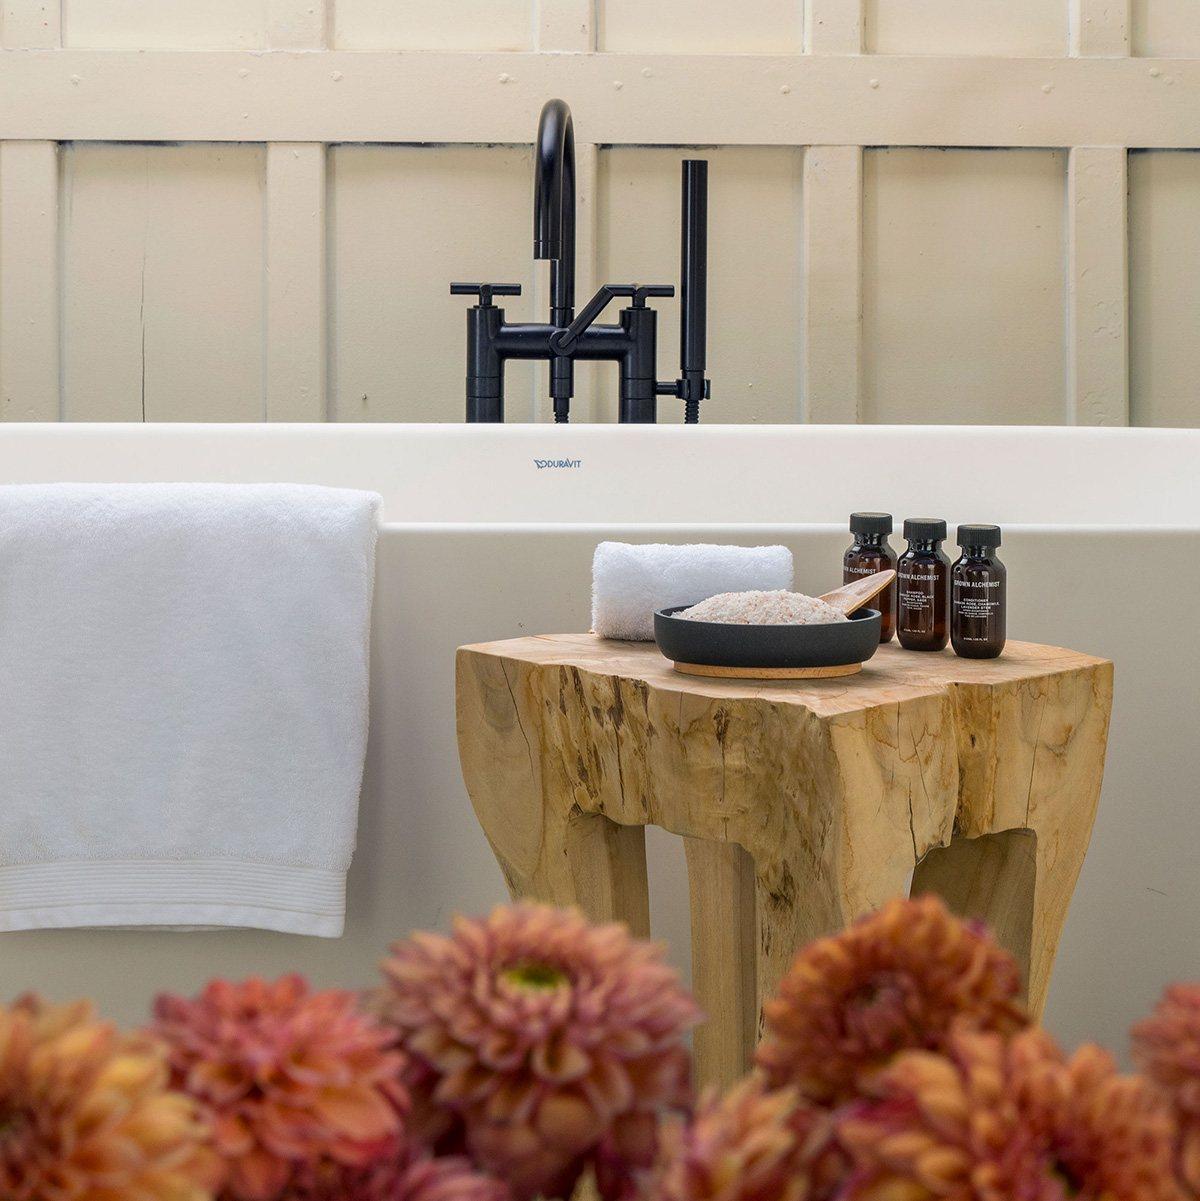 MacArthur Place bathtub